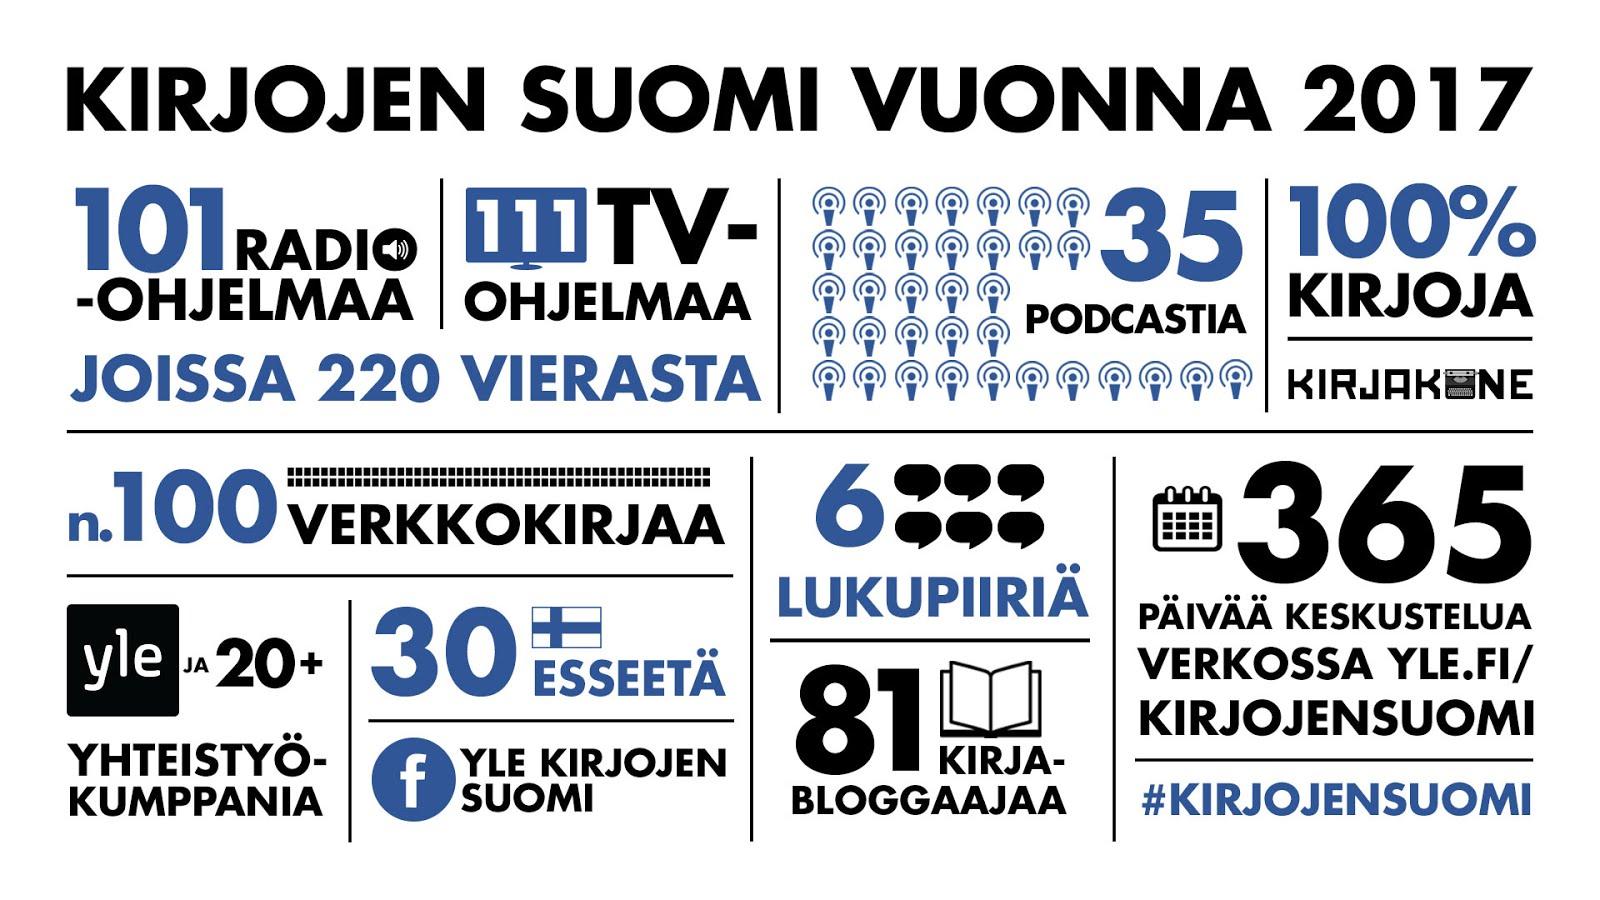 Yle Kirjojen suomi